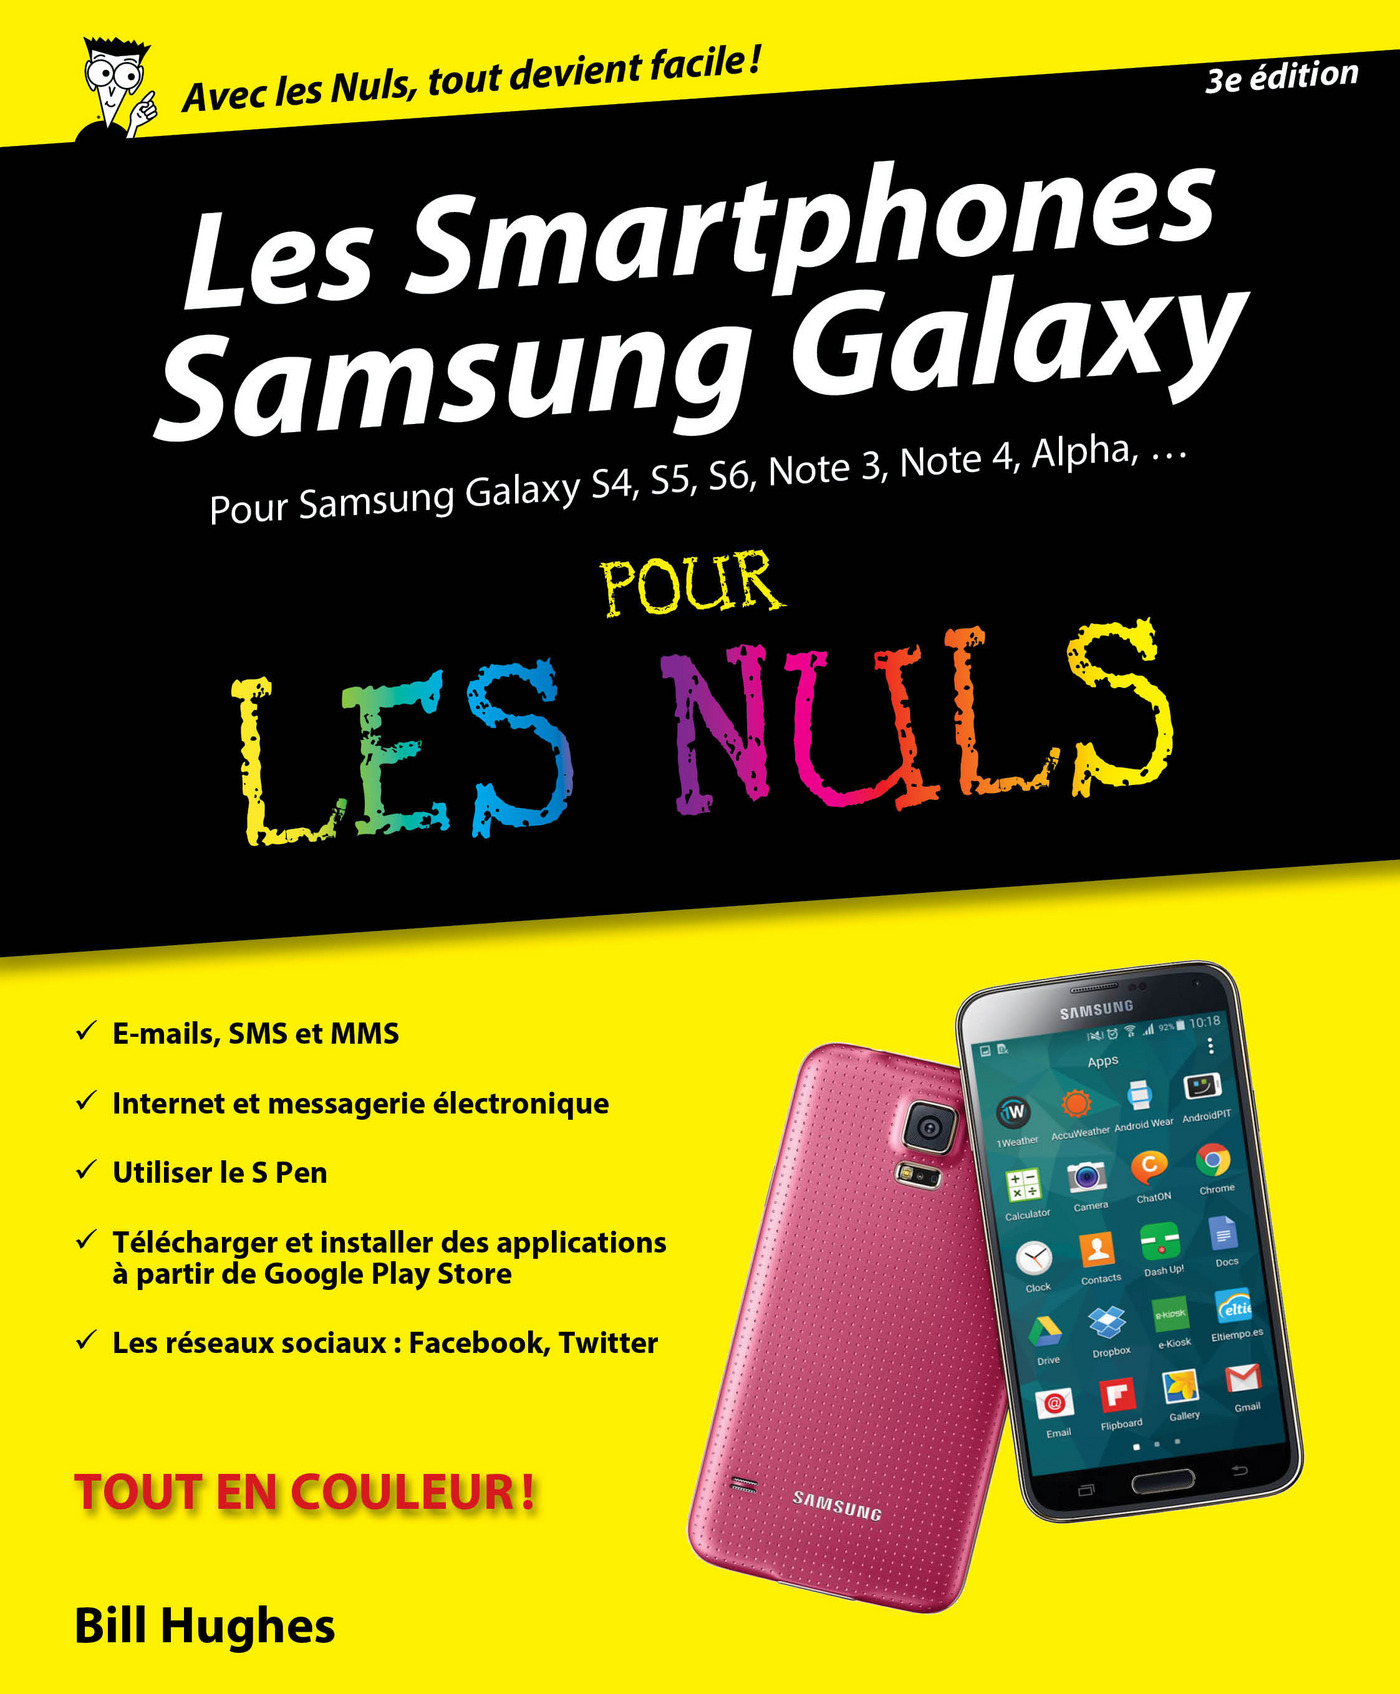 Smartphones Samsung Galaxy Pour les Nuls, 2ème édition (ebook)